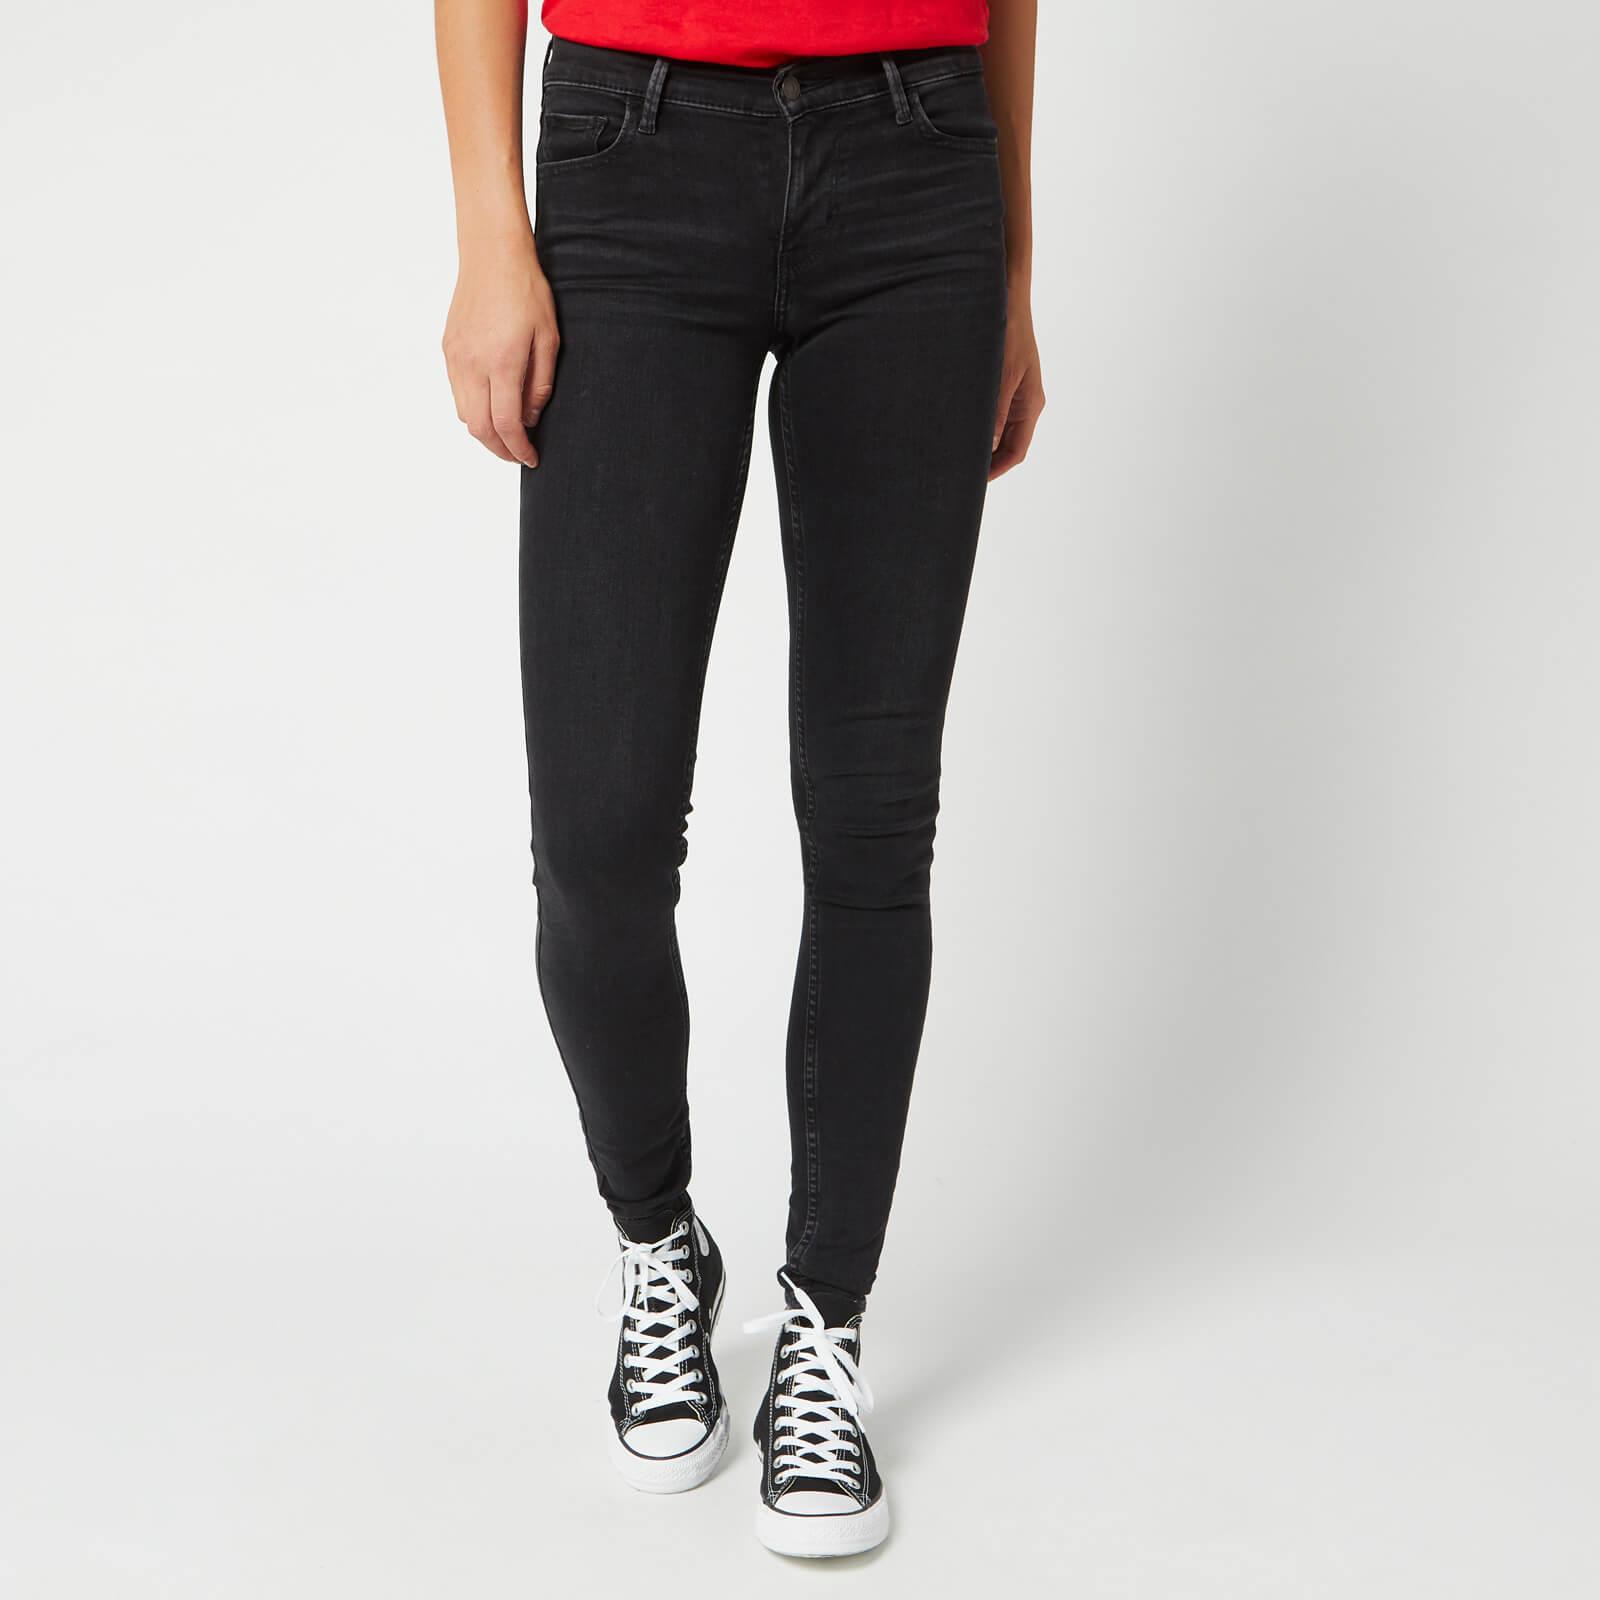 Levi's s Innovation Super Skinny Jeans - Freak Out - W27/L30